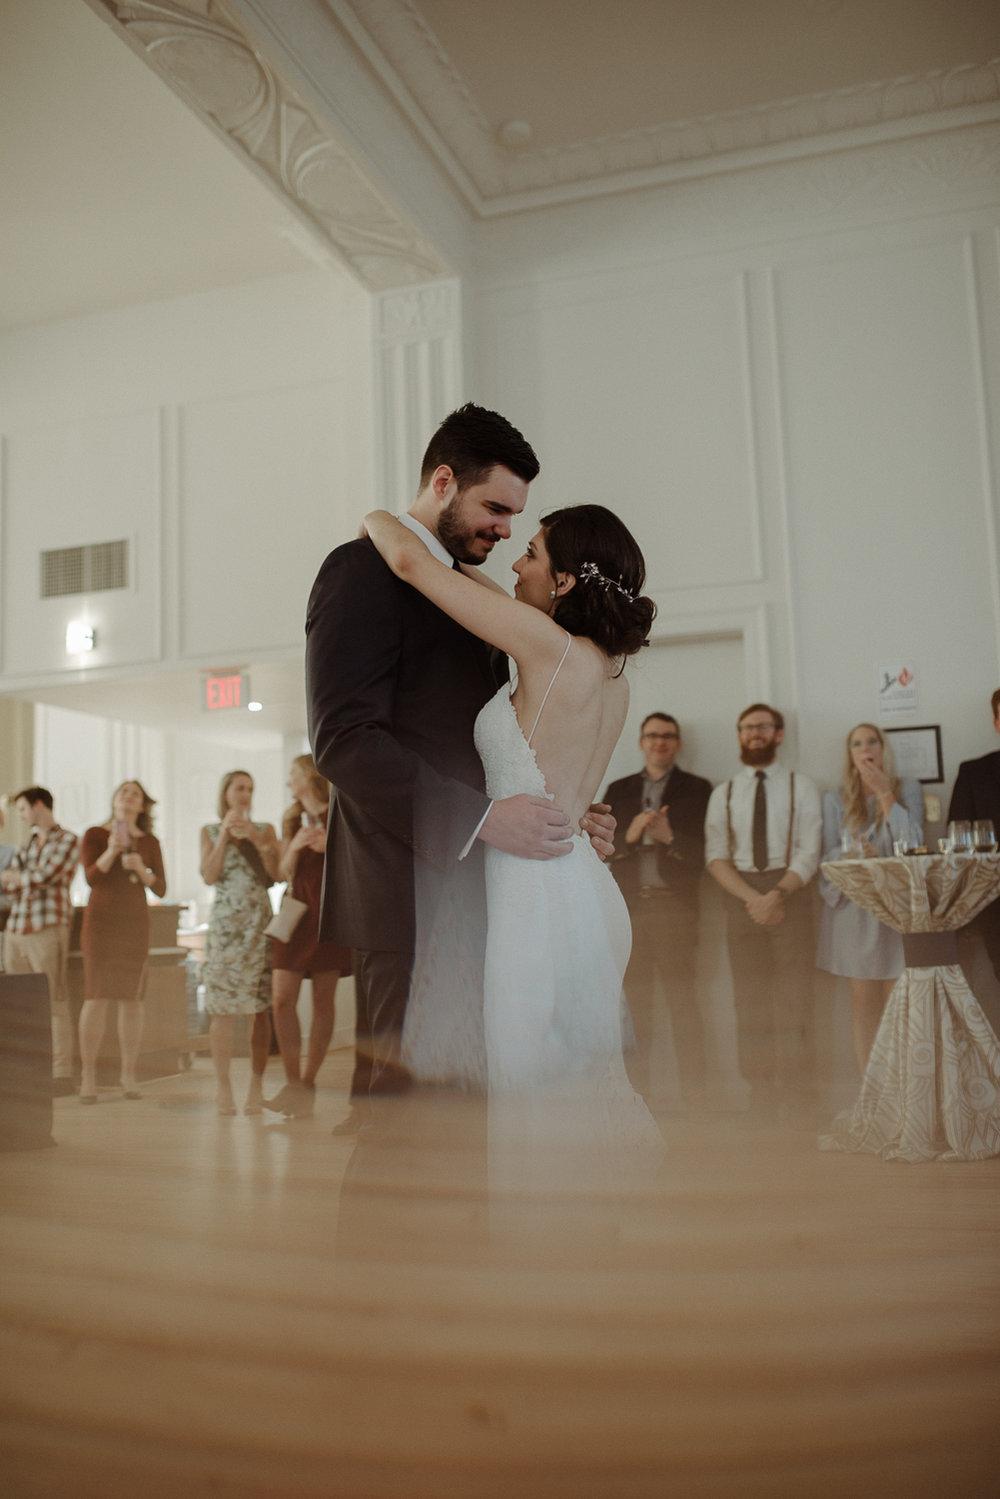 Enowen-Photography-wedding-raleigh-cannon-room-vivian-devon (44 of 56).jpg